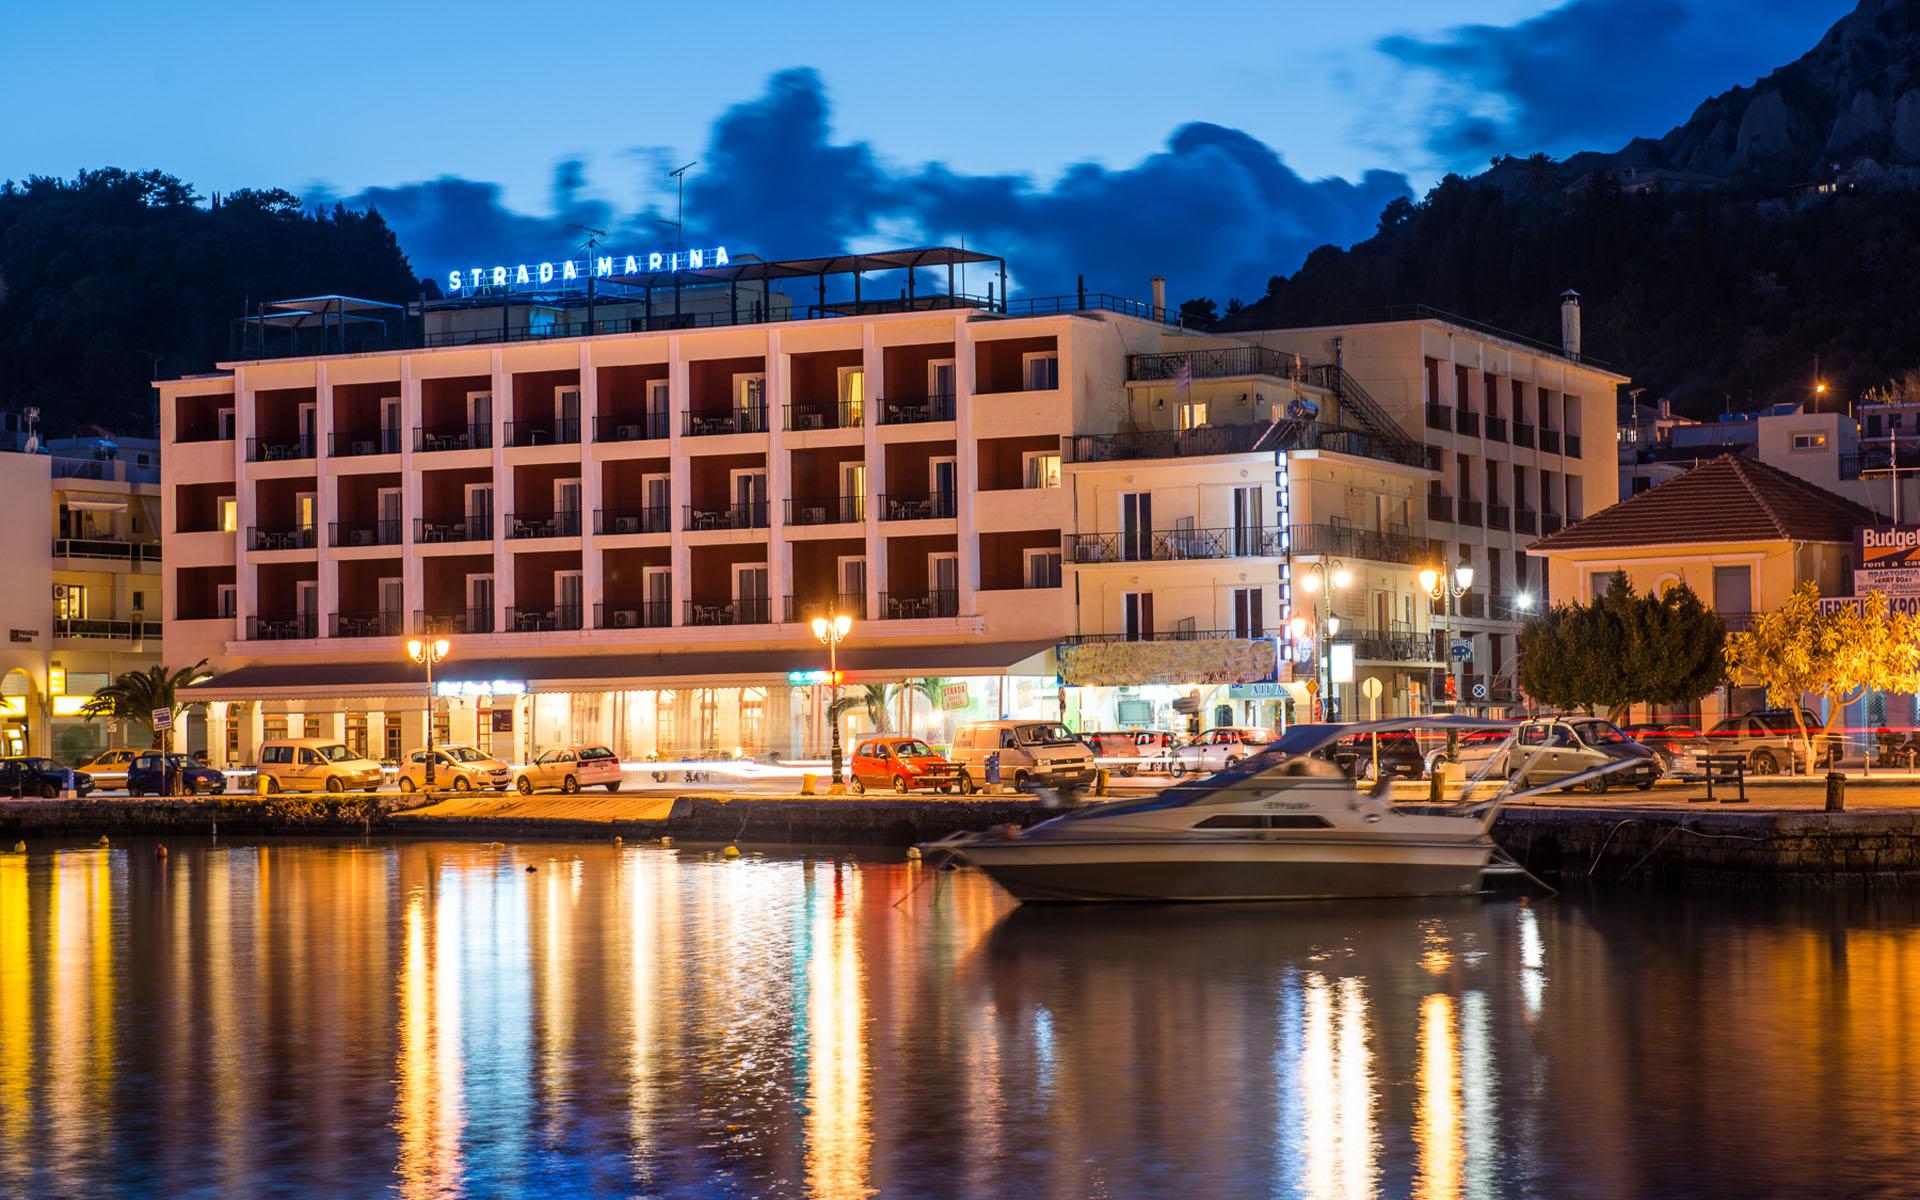 4* Strada Marina Hotel - Ζάκυνθος ✦ 3 Ημέρες (2 Διανυκτερεύσεις)